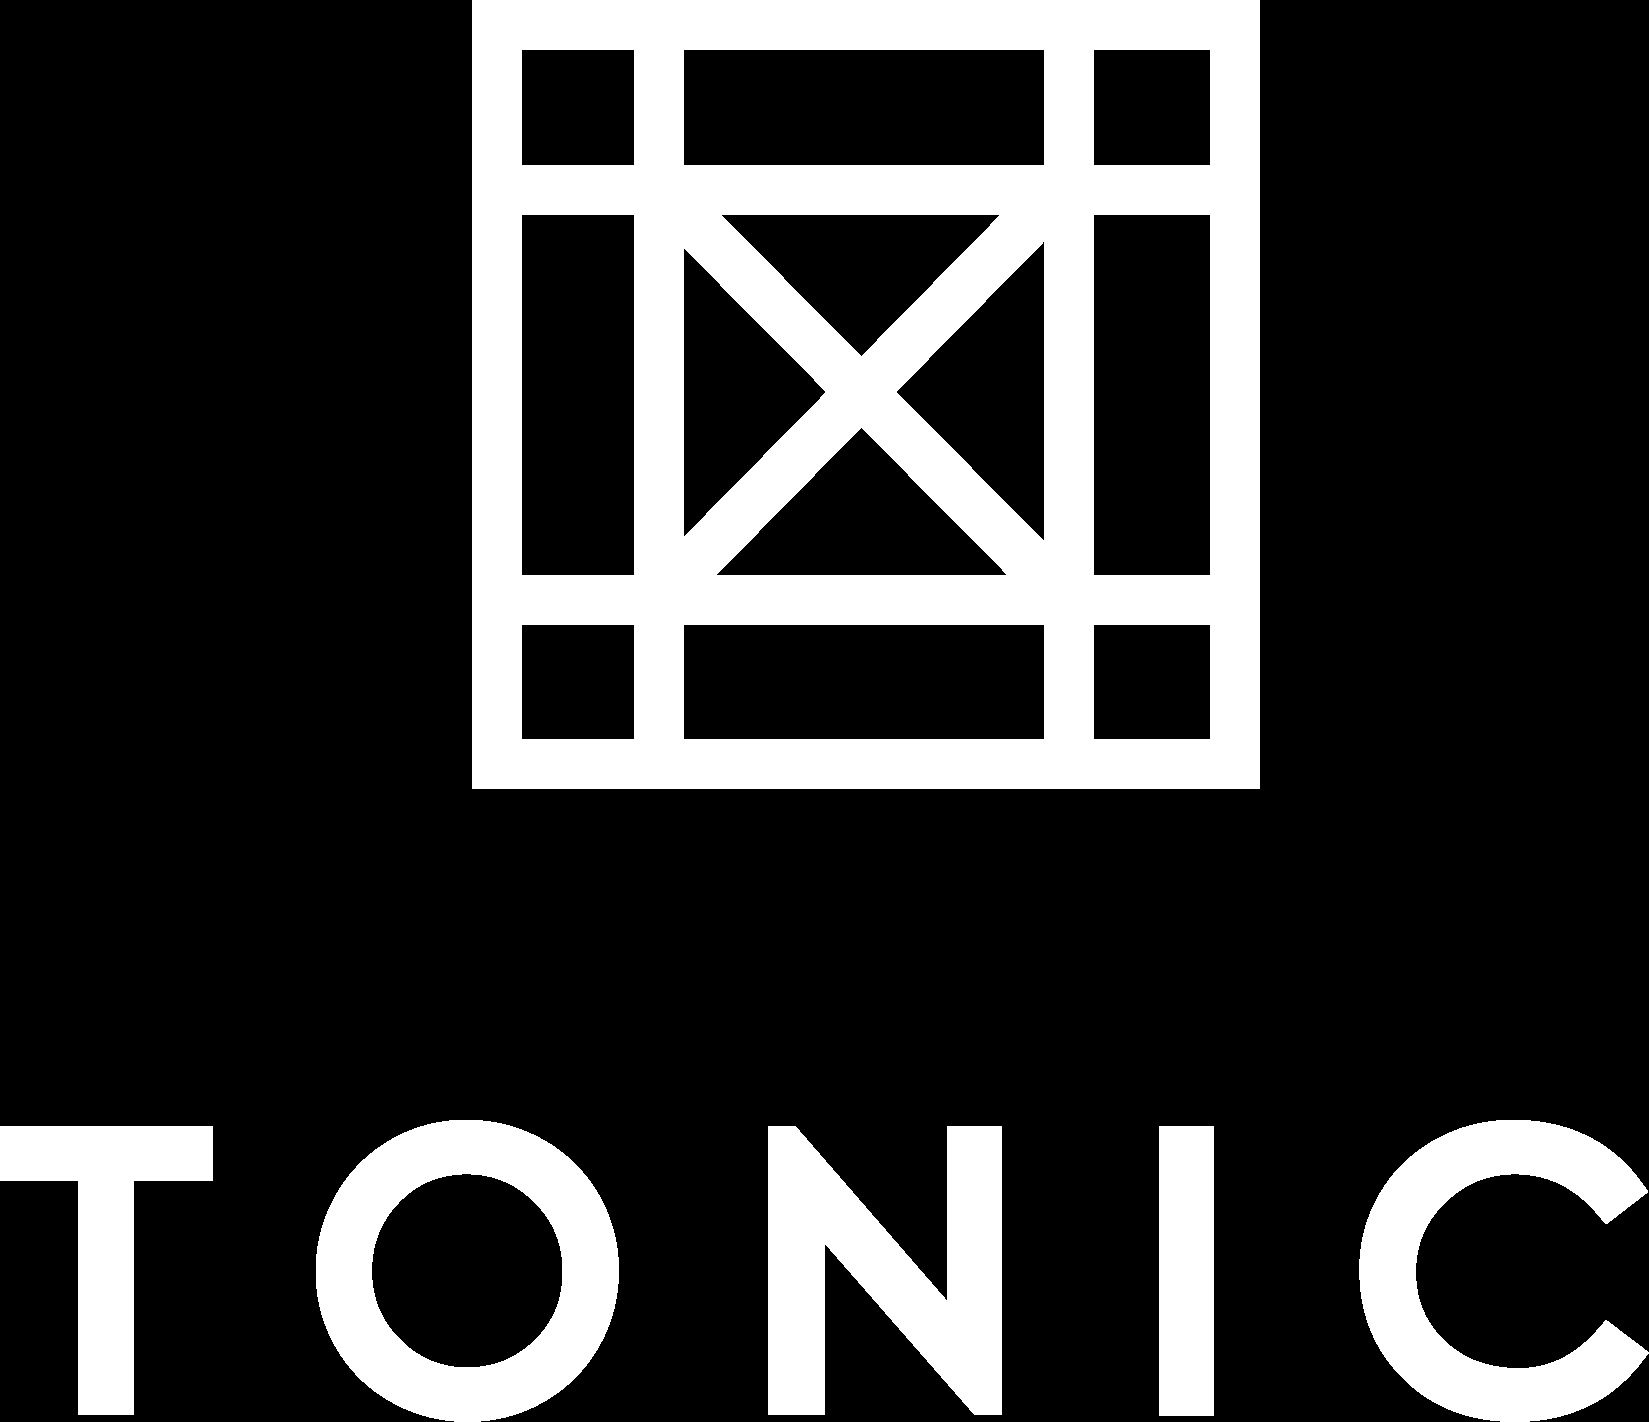 Tonic Craft Beer & Cocktail Bar